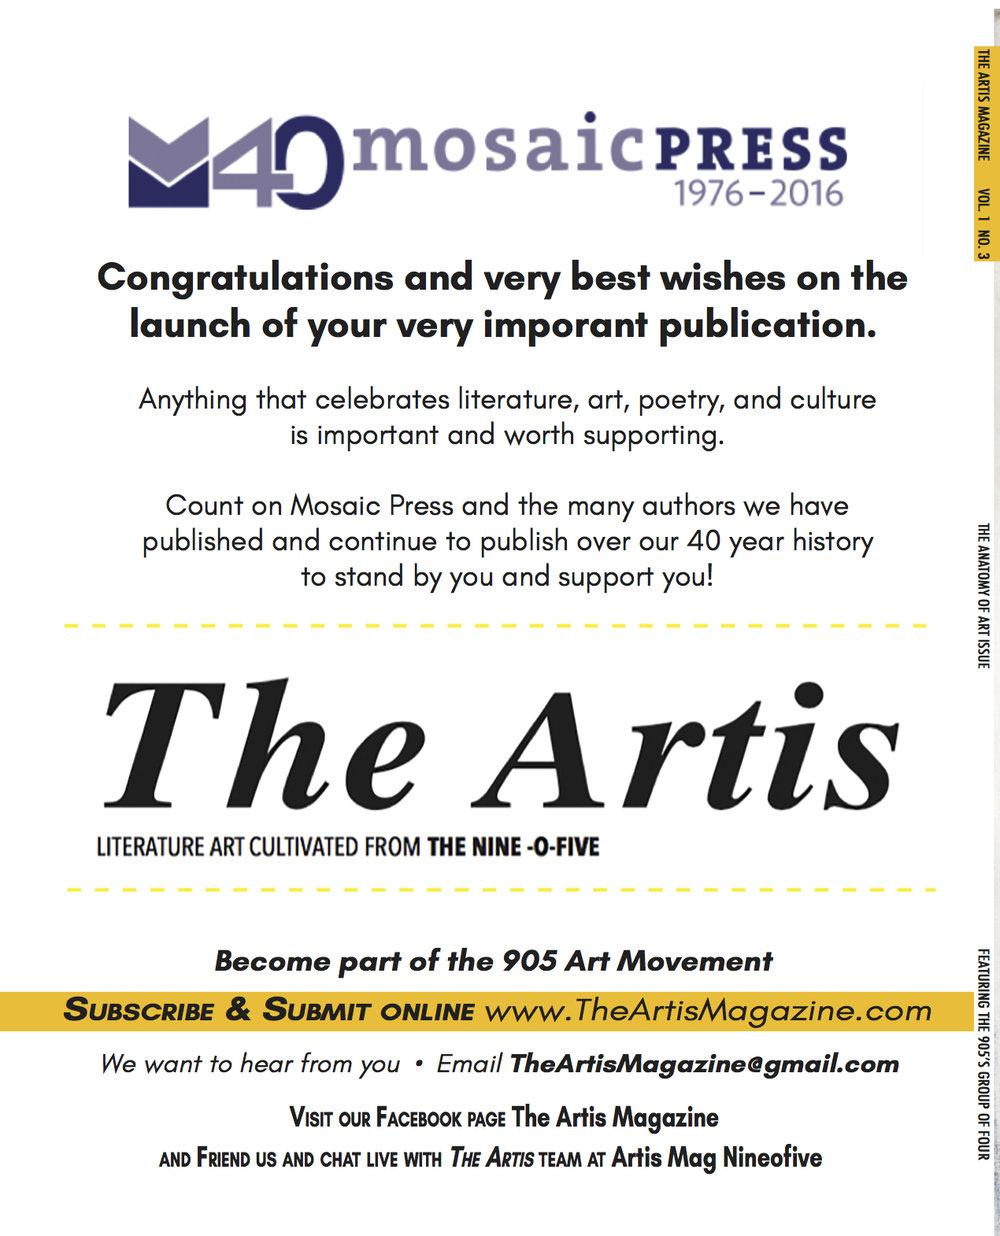 Artis 3 mosaic ad.jpg